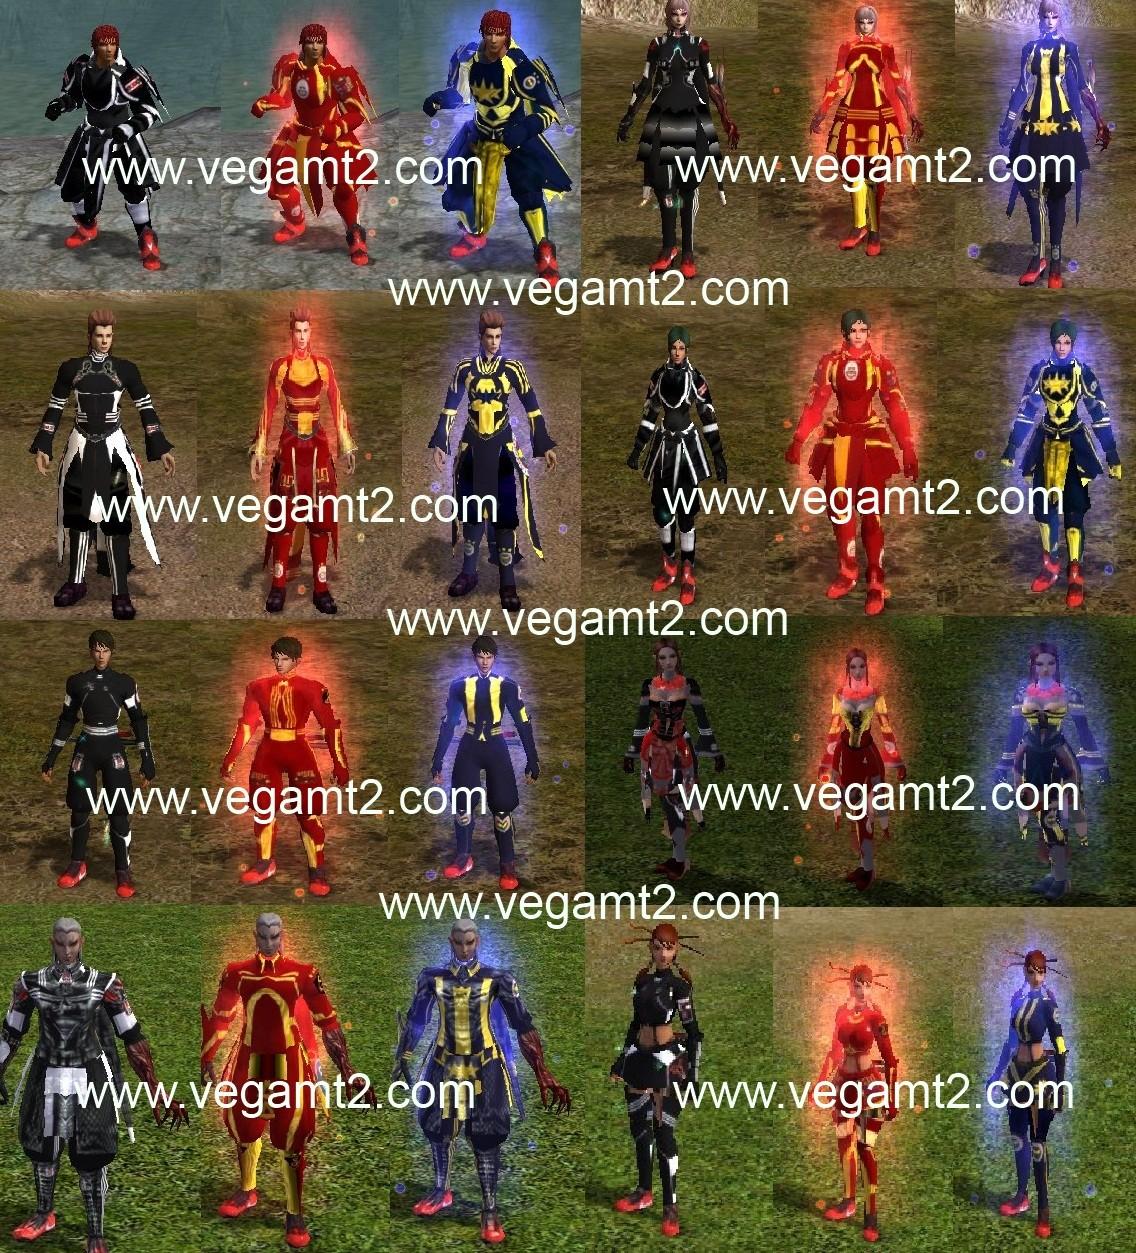 VegaMt2 149 Level Ba Lang Taraftar Z Rhlar 60 Adet Yeni